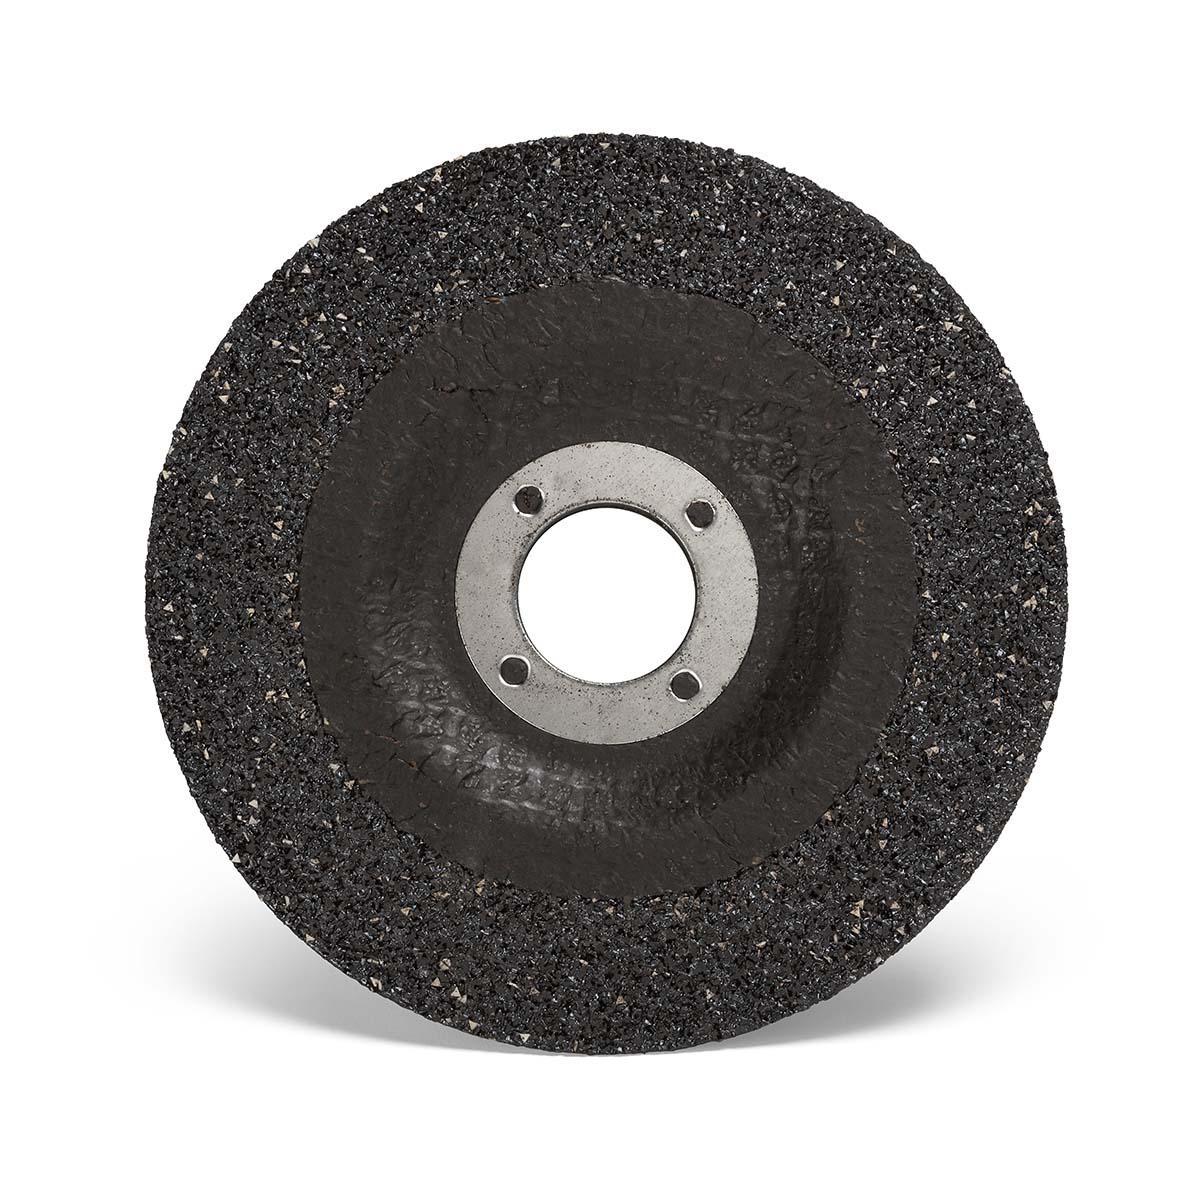 "3Mâ""¢ Silver Cut-Off Wheel 87466, T27, 4.5 in x .045 in x 7/8 in, 25 per inne"